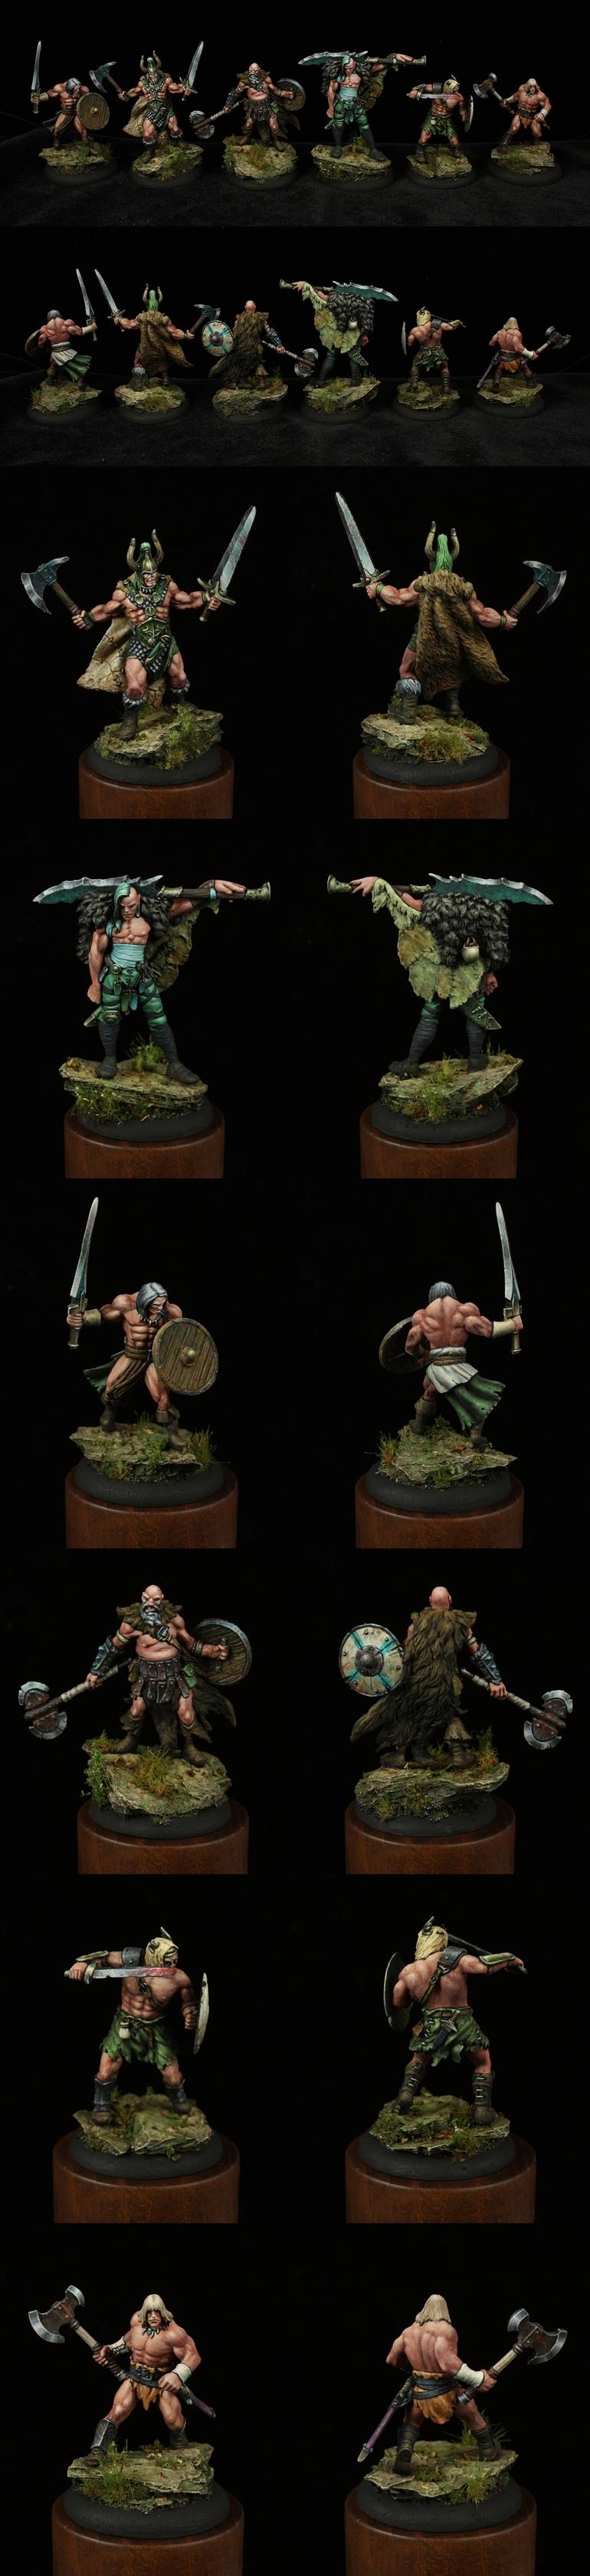 Barbarian Army - Part 3/1